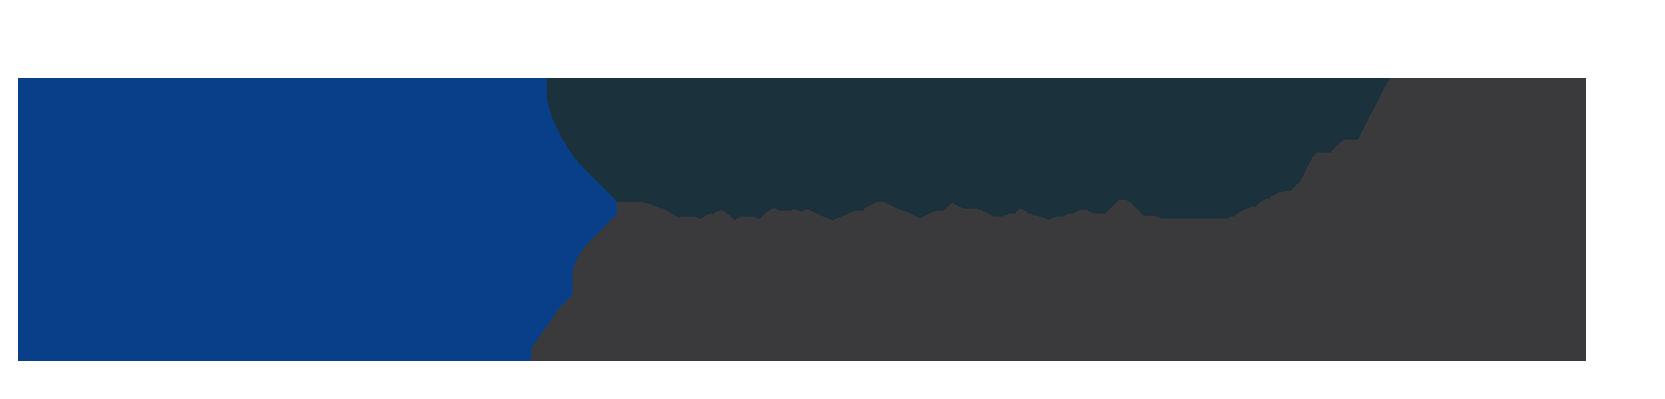 CRA-RN